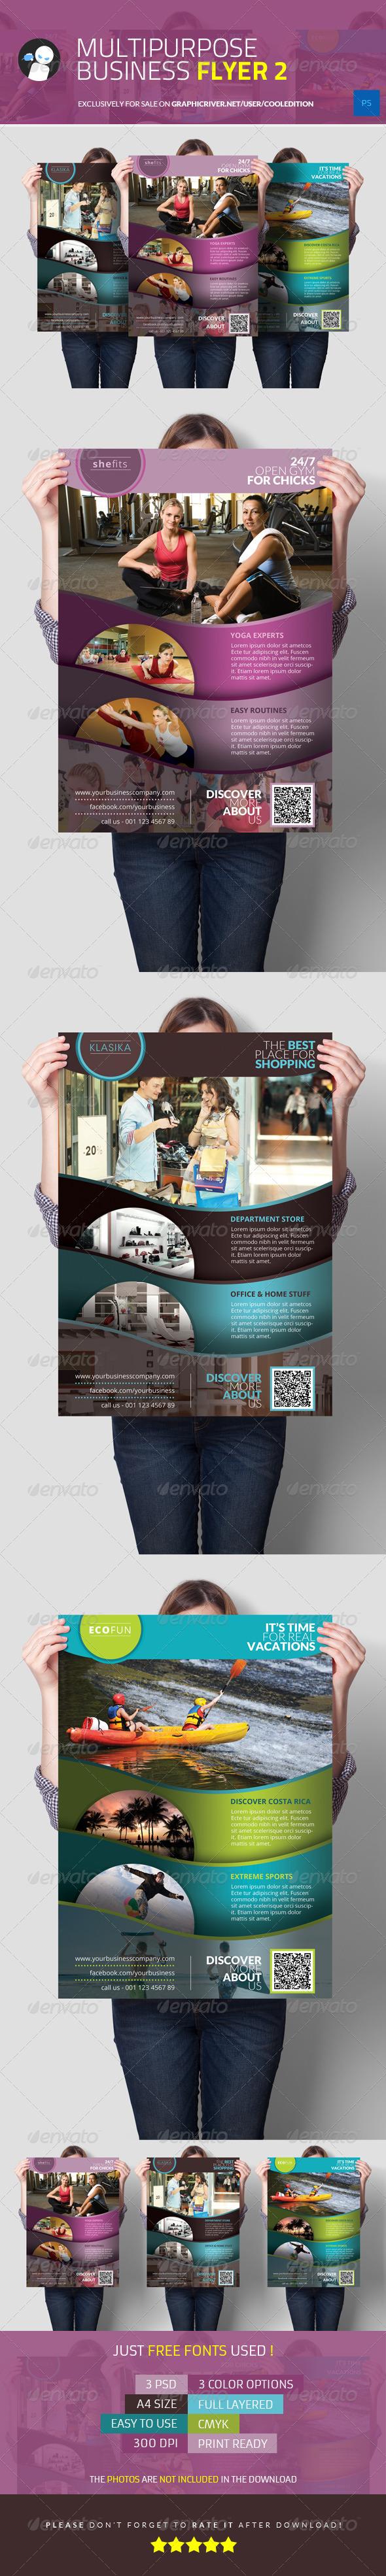 Multipurpose Business Flyer 2 - Commerce Flyers